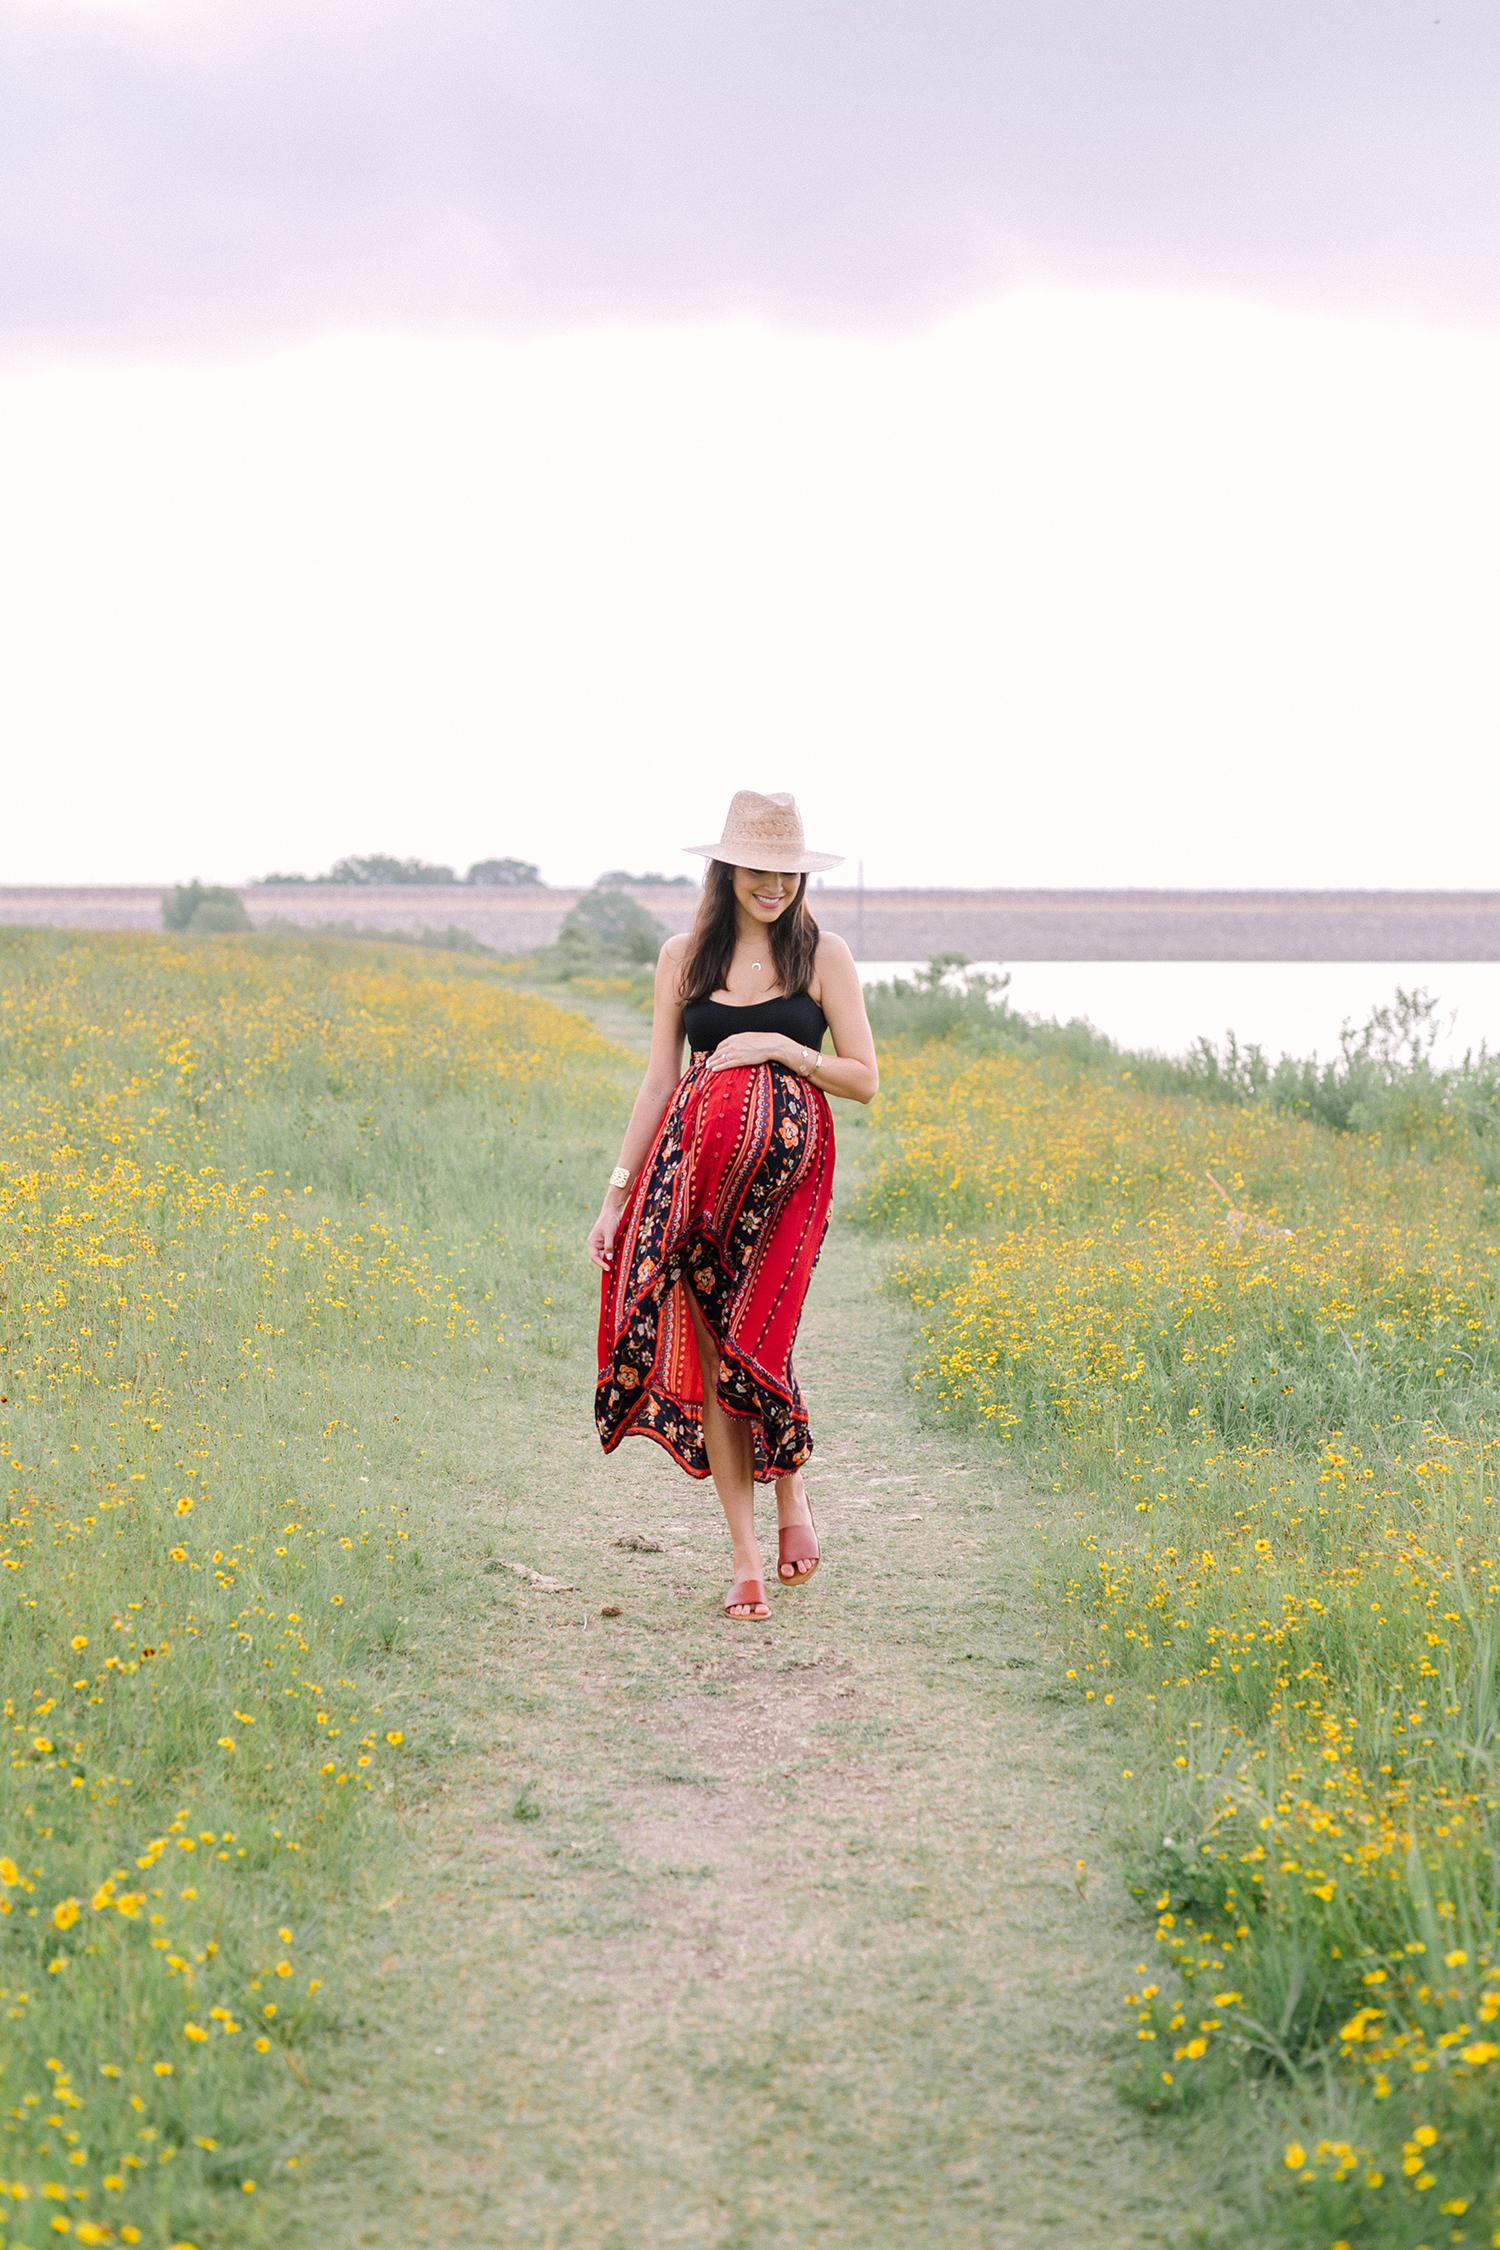 austin-atx-maternity-pregnancy-photographer-kbp-27.jpg